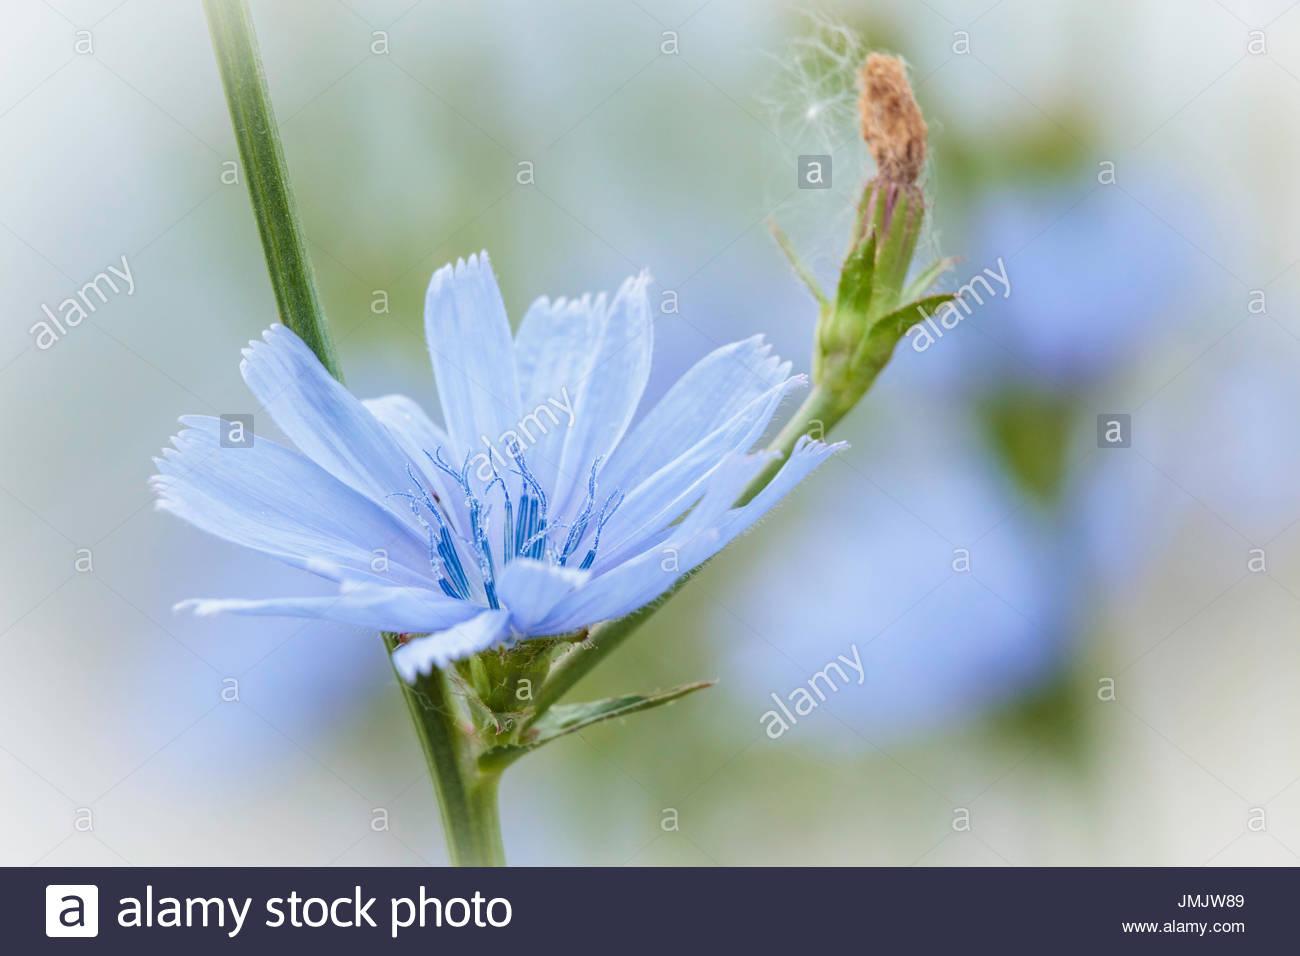 chicory Cichorium intybus Asteraceae flower wildflower blue daisy blue dandelion blue sailors blue weed bunk coffeeweed - Stock Image